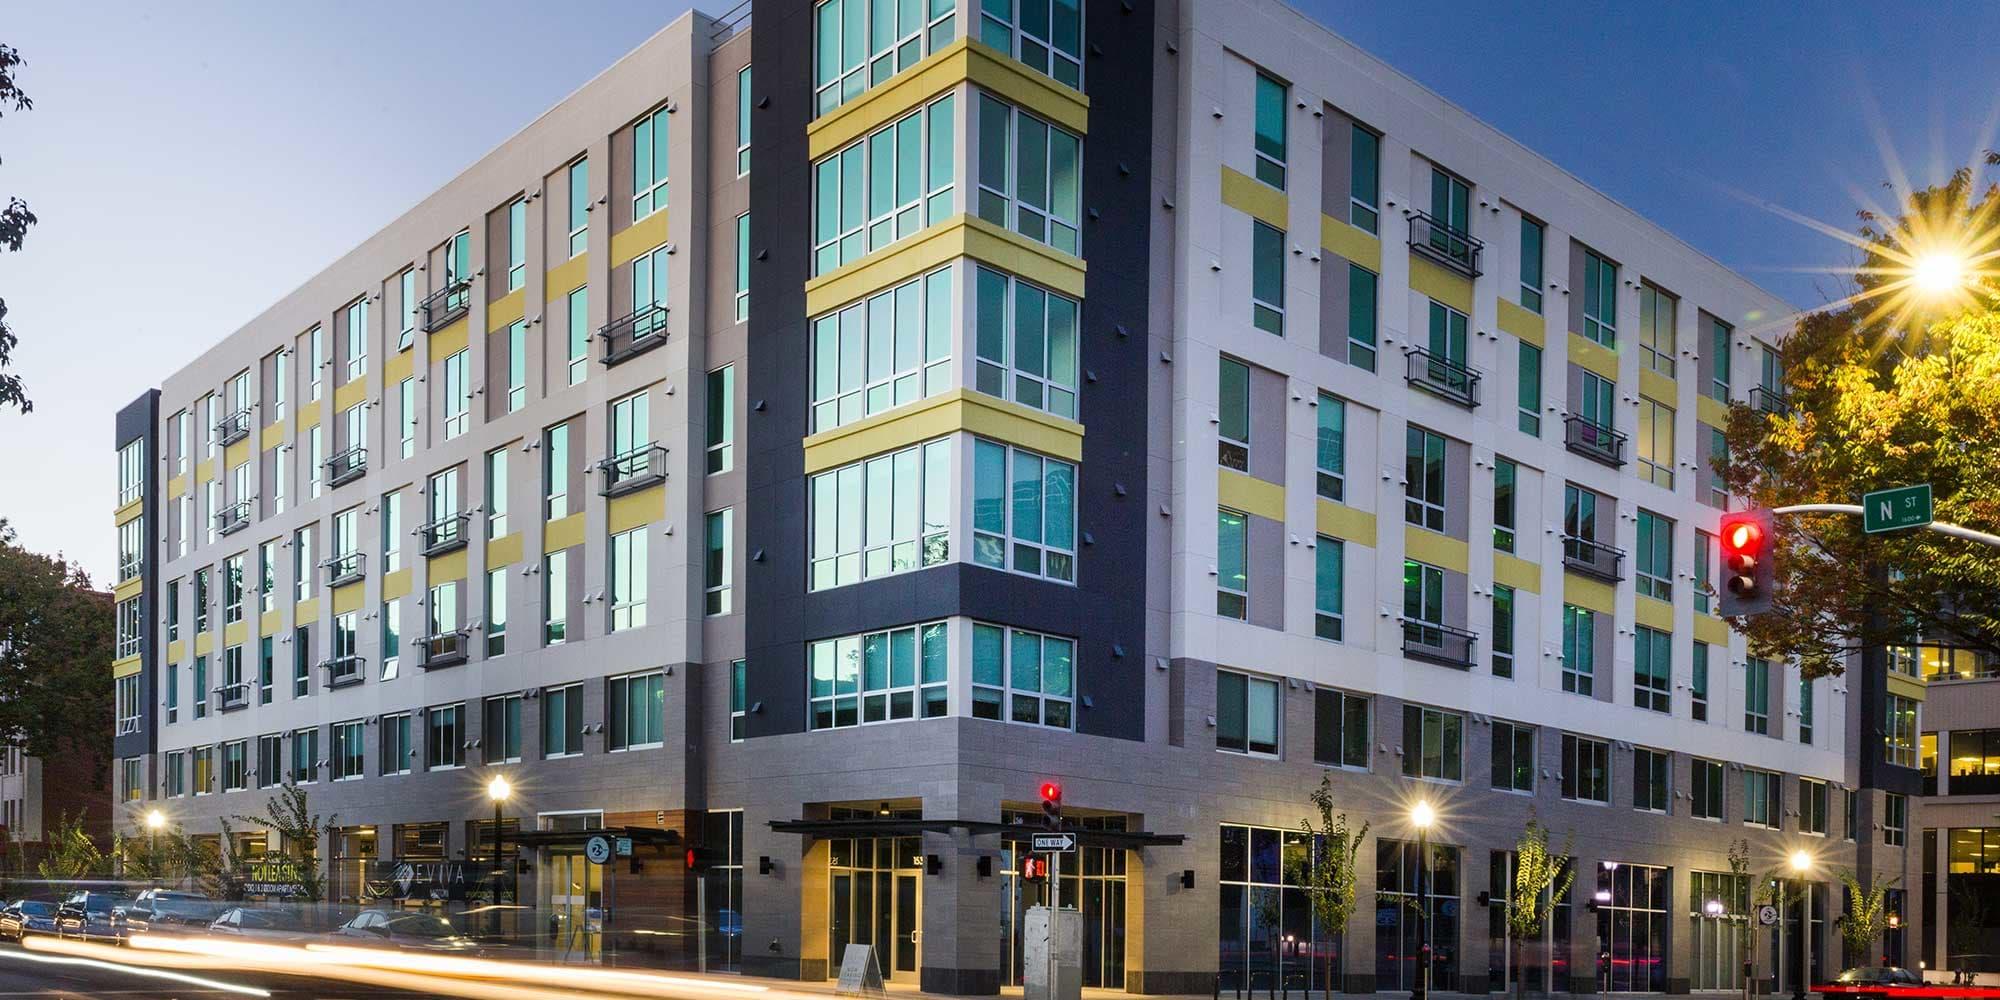 EVIVA Midtown apartments in Sacramento, California